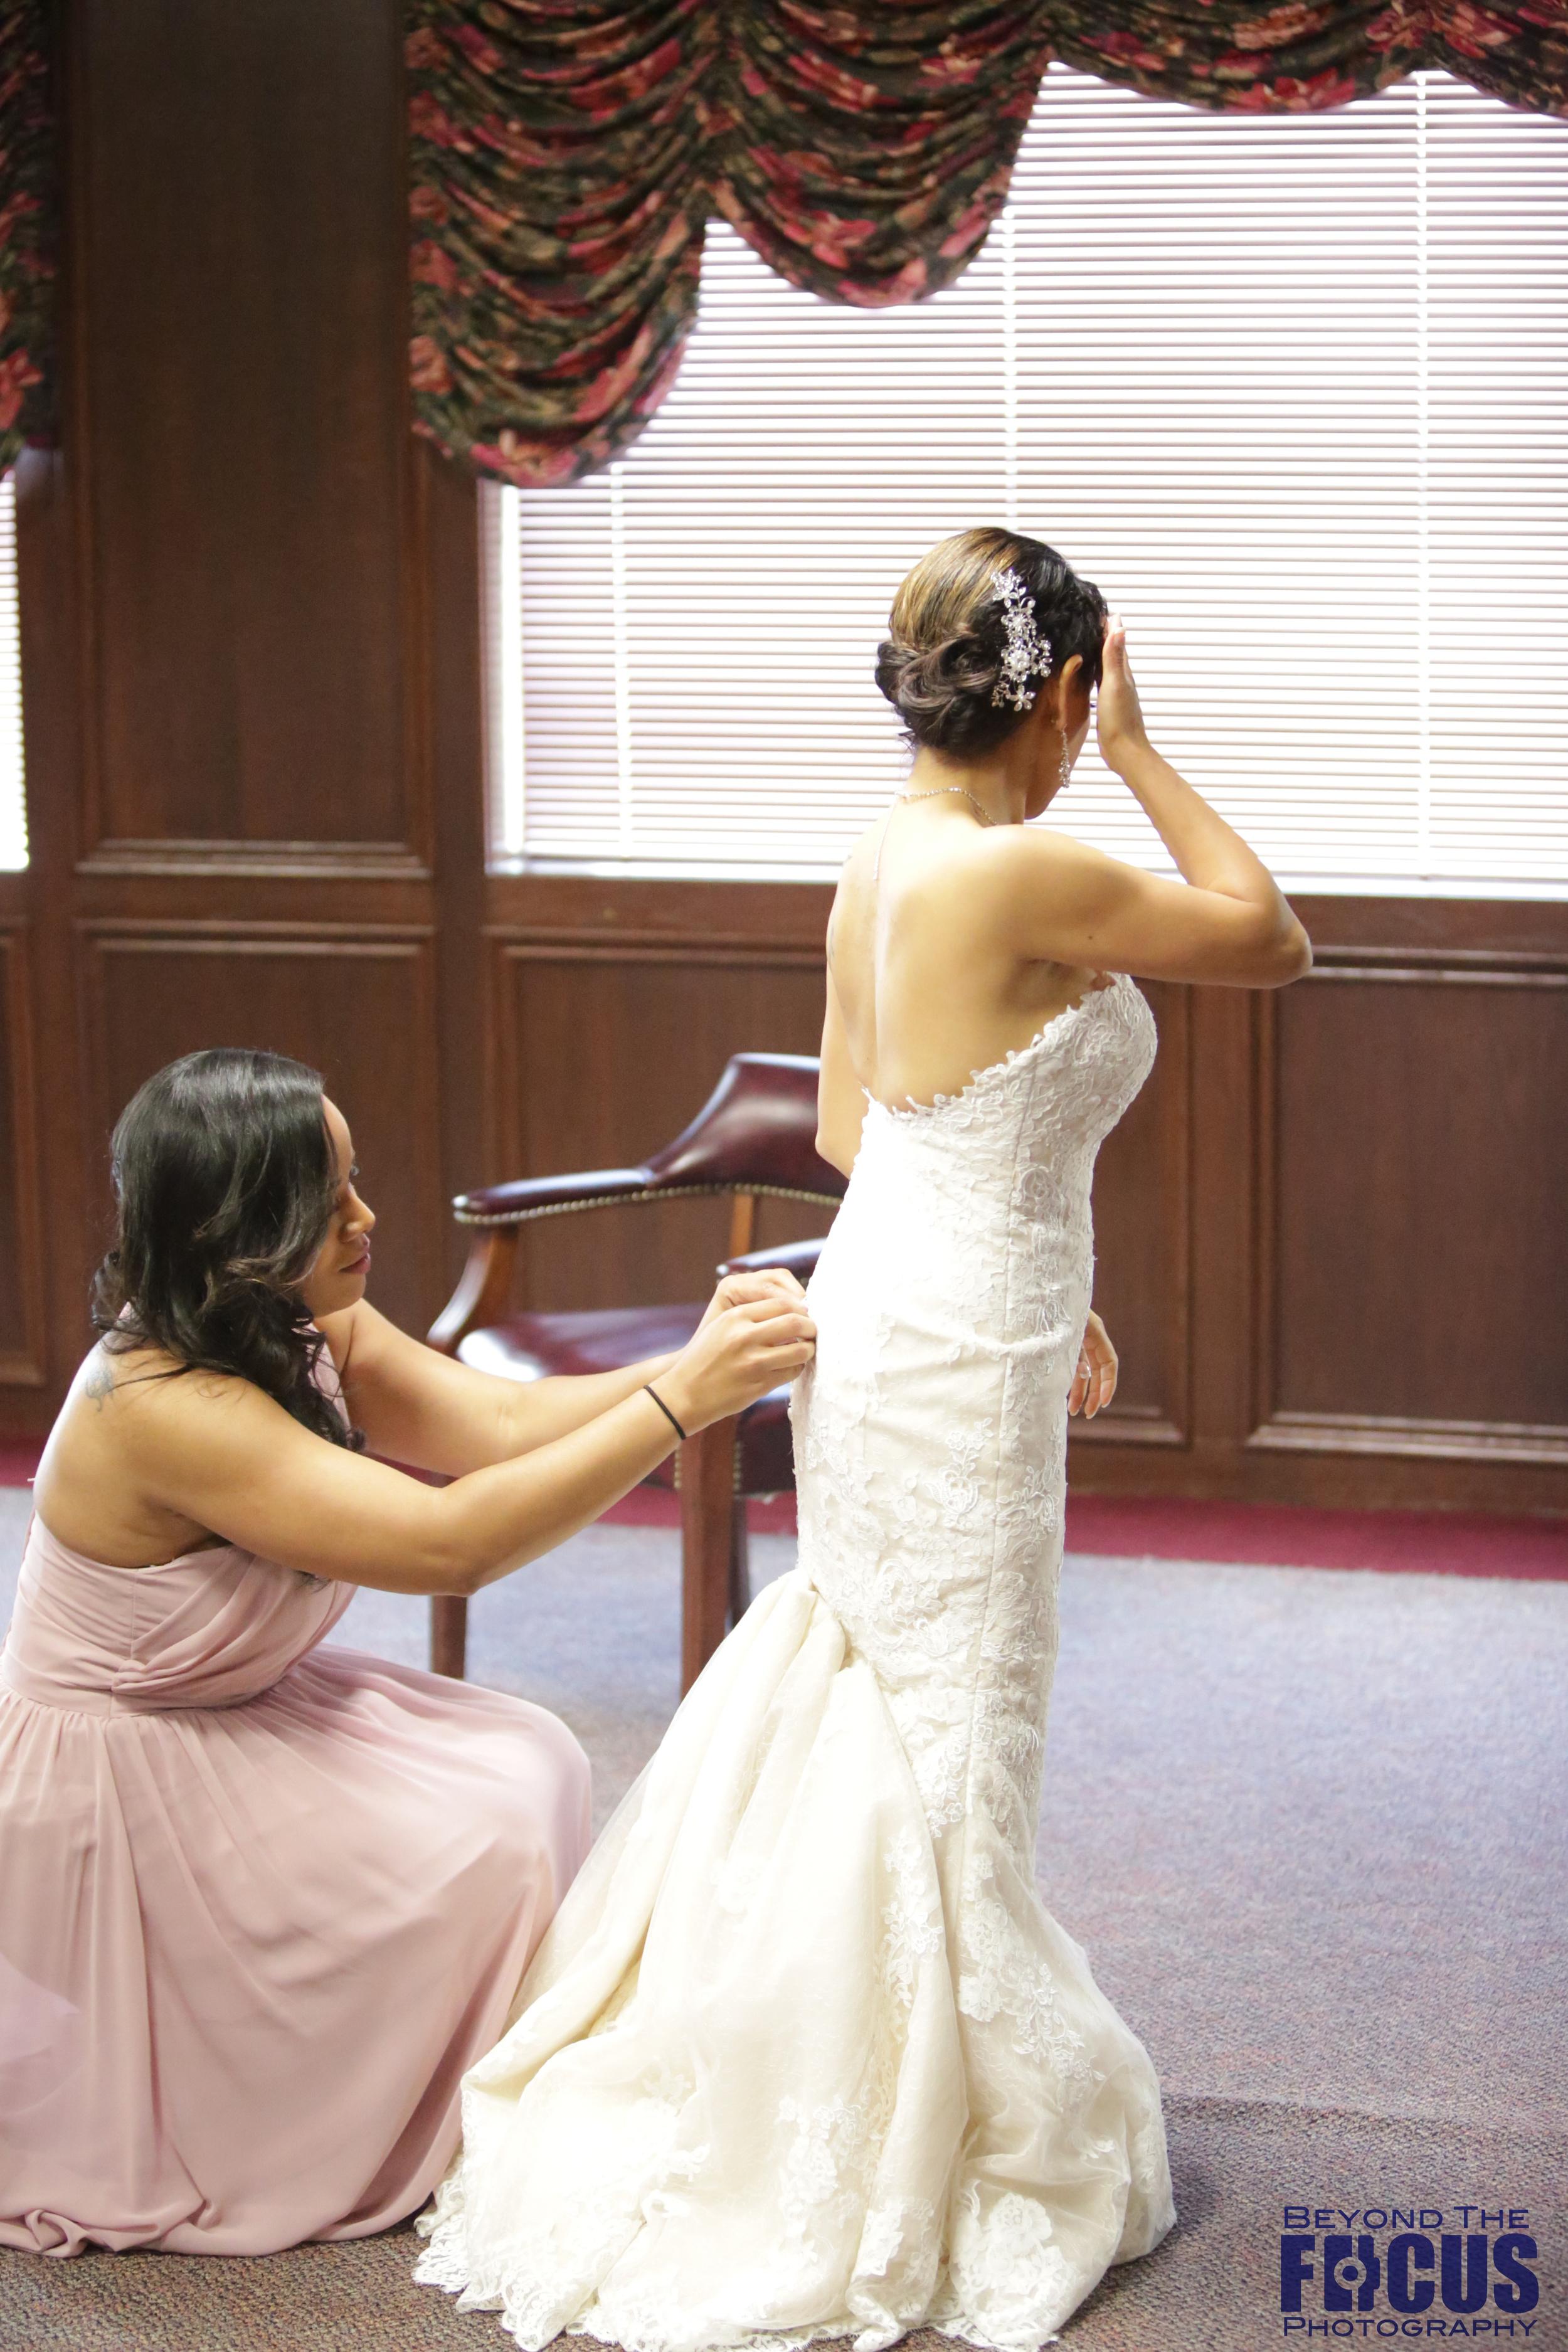 Palmer Wedding - Candids14.jpg